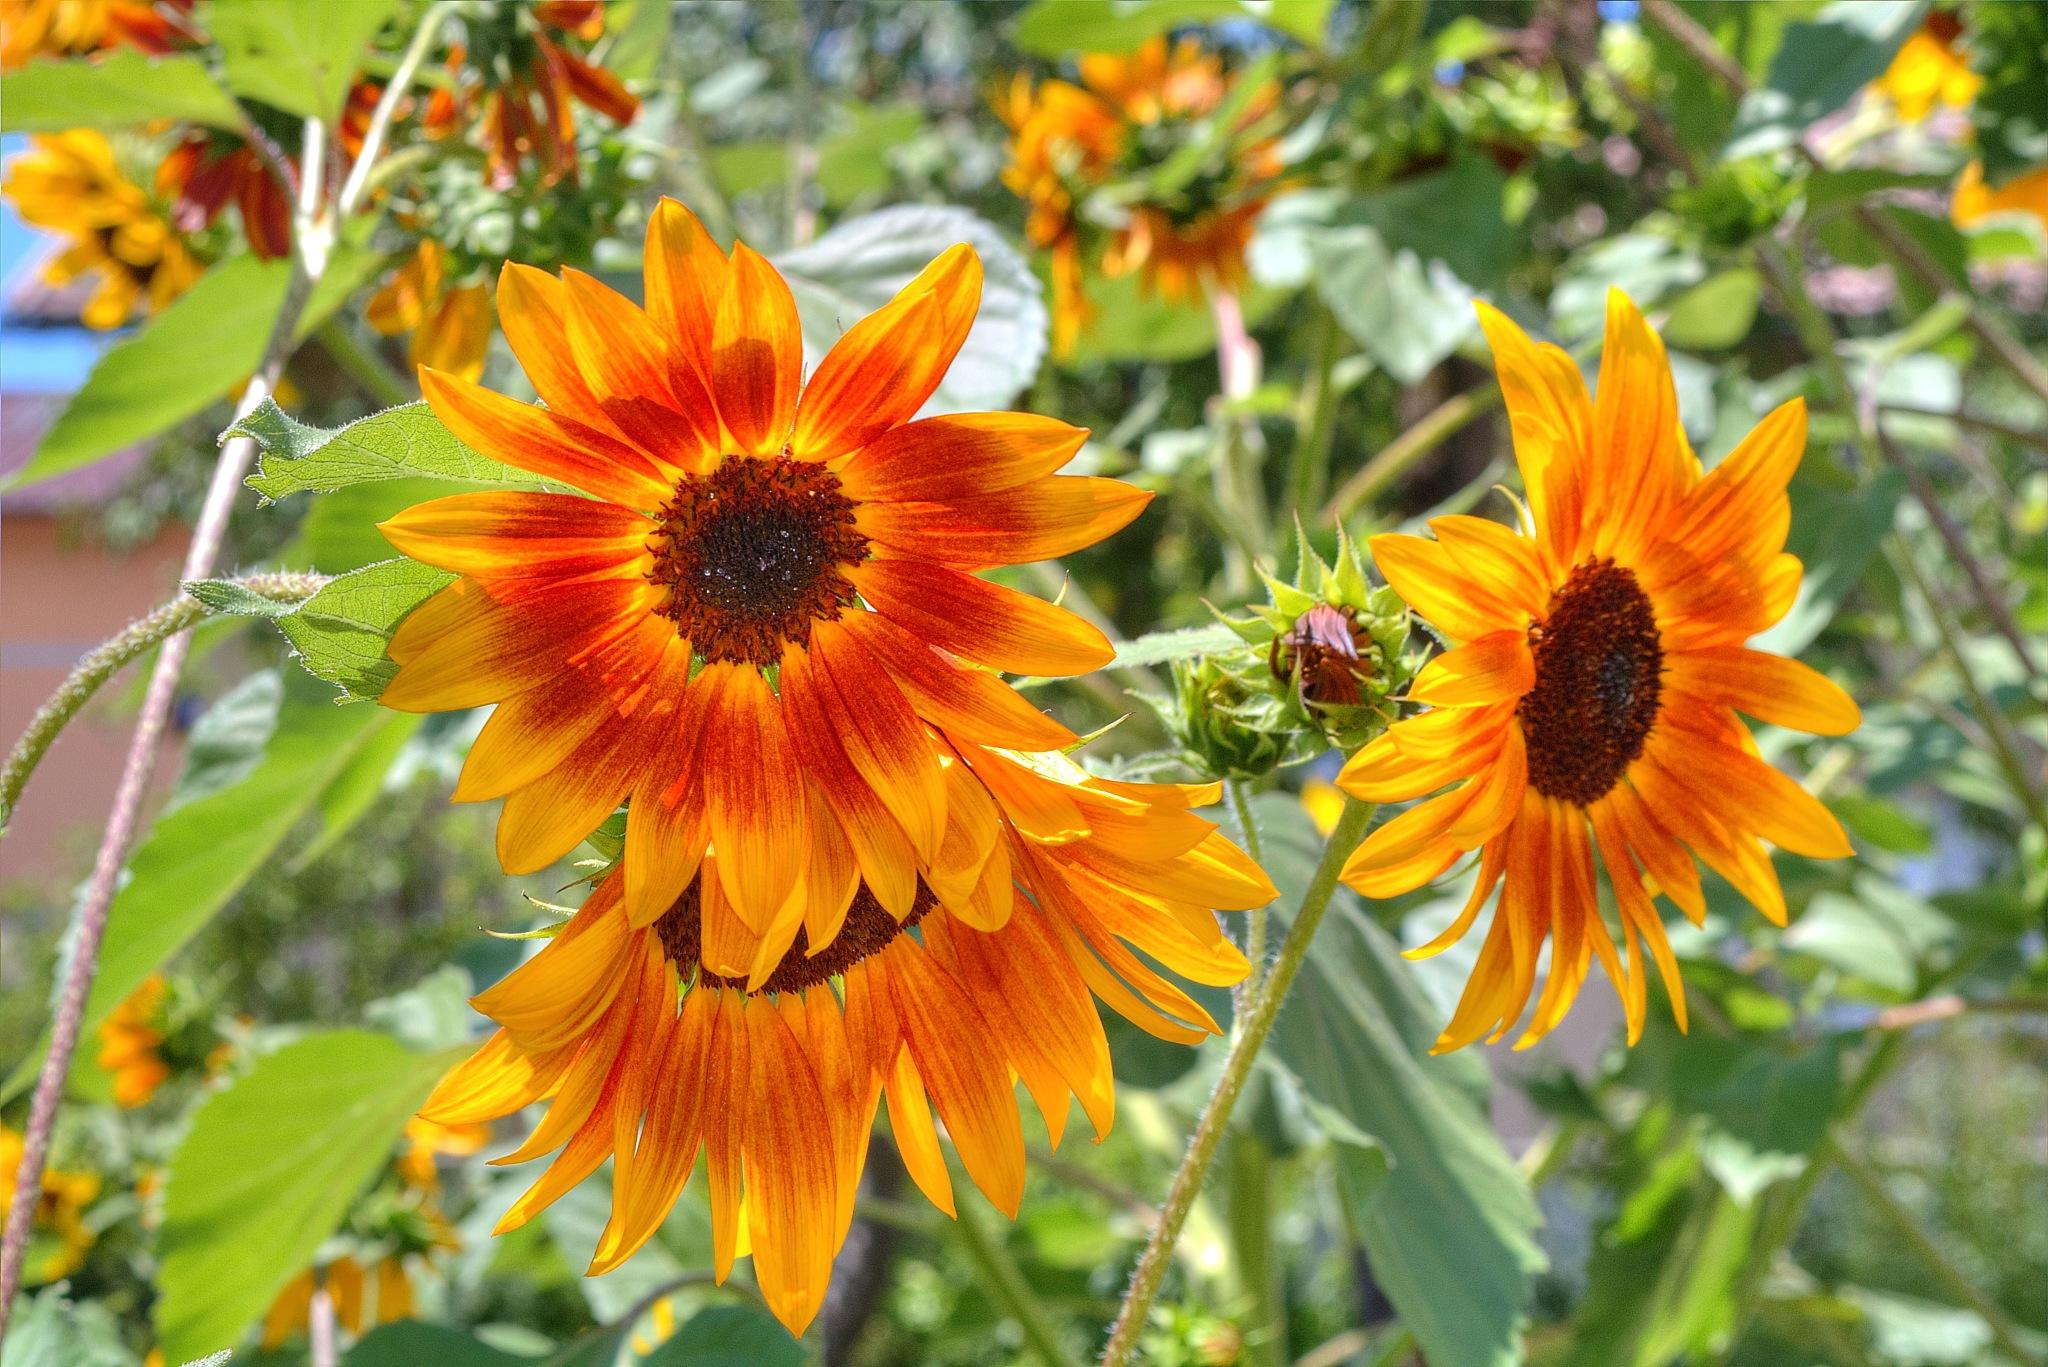 Sunflowers  3 by zvnktomasevic